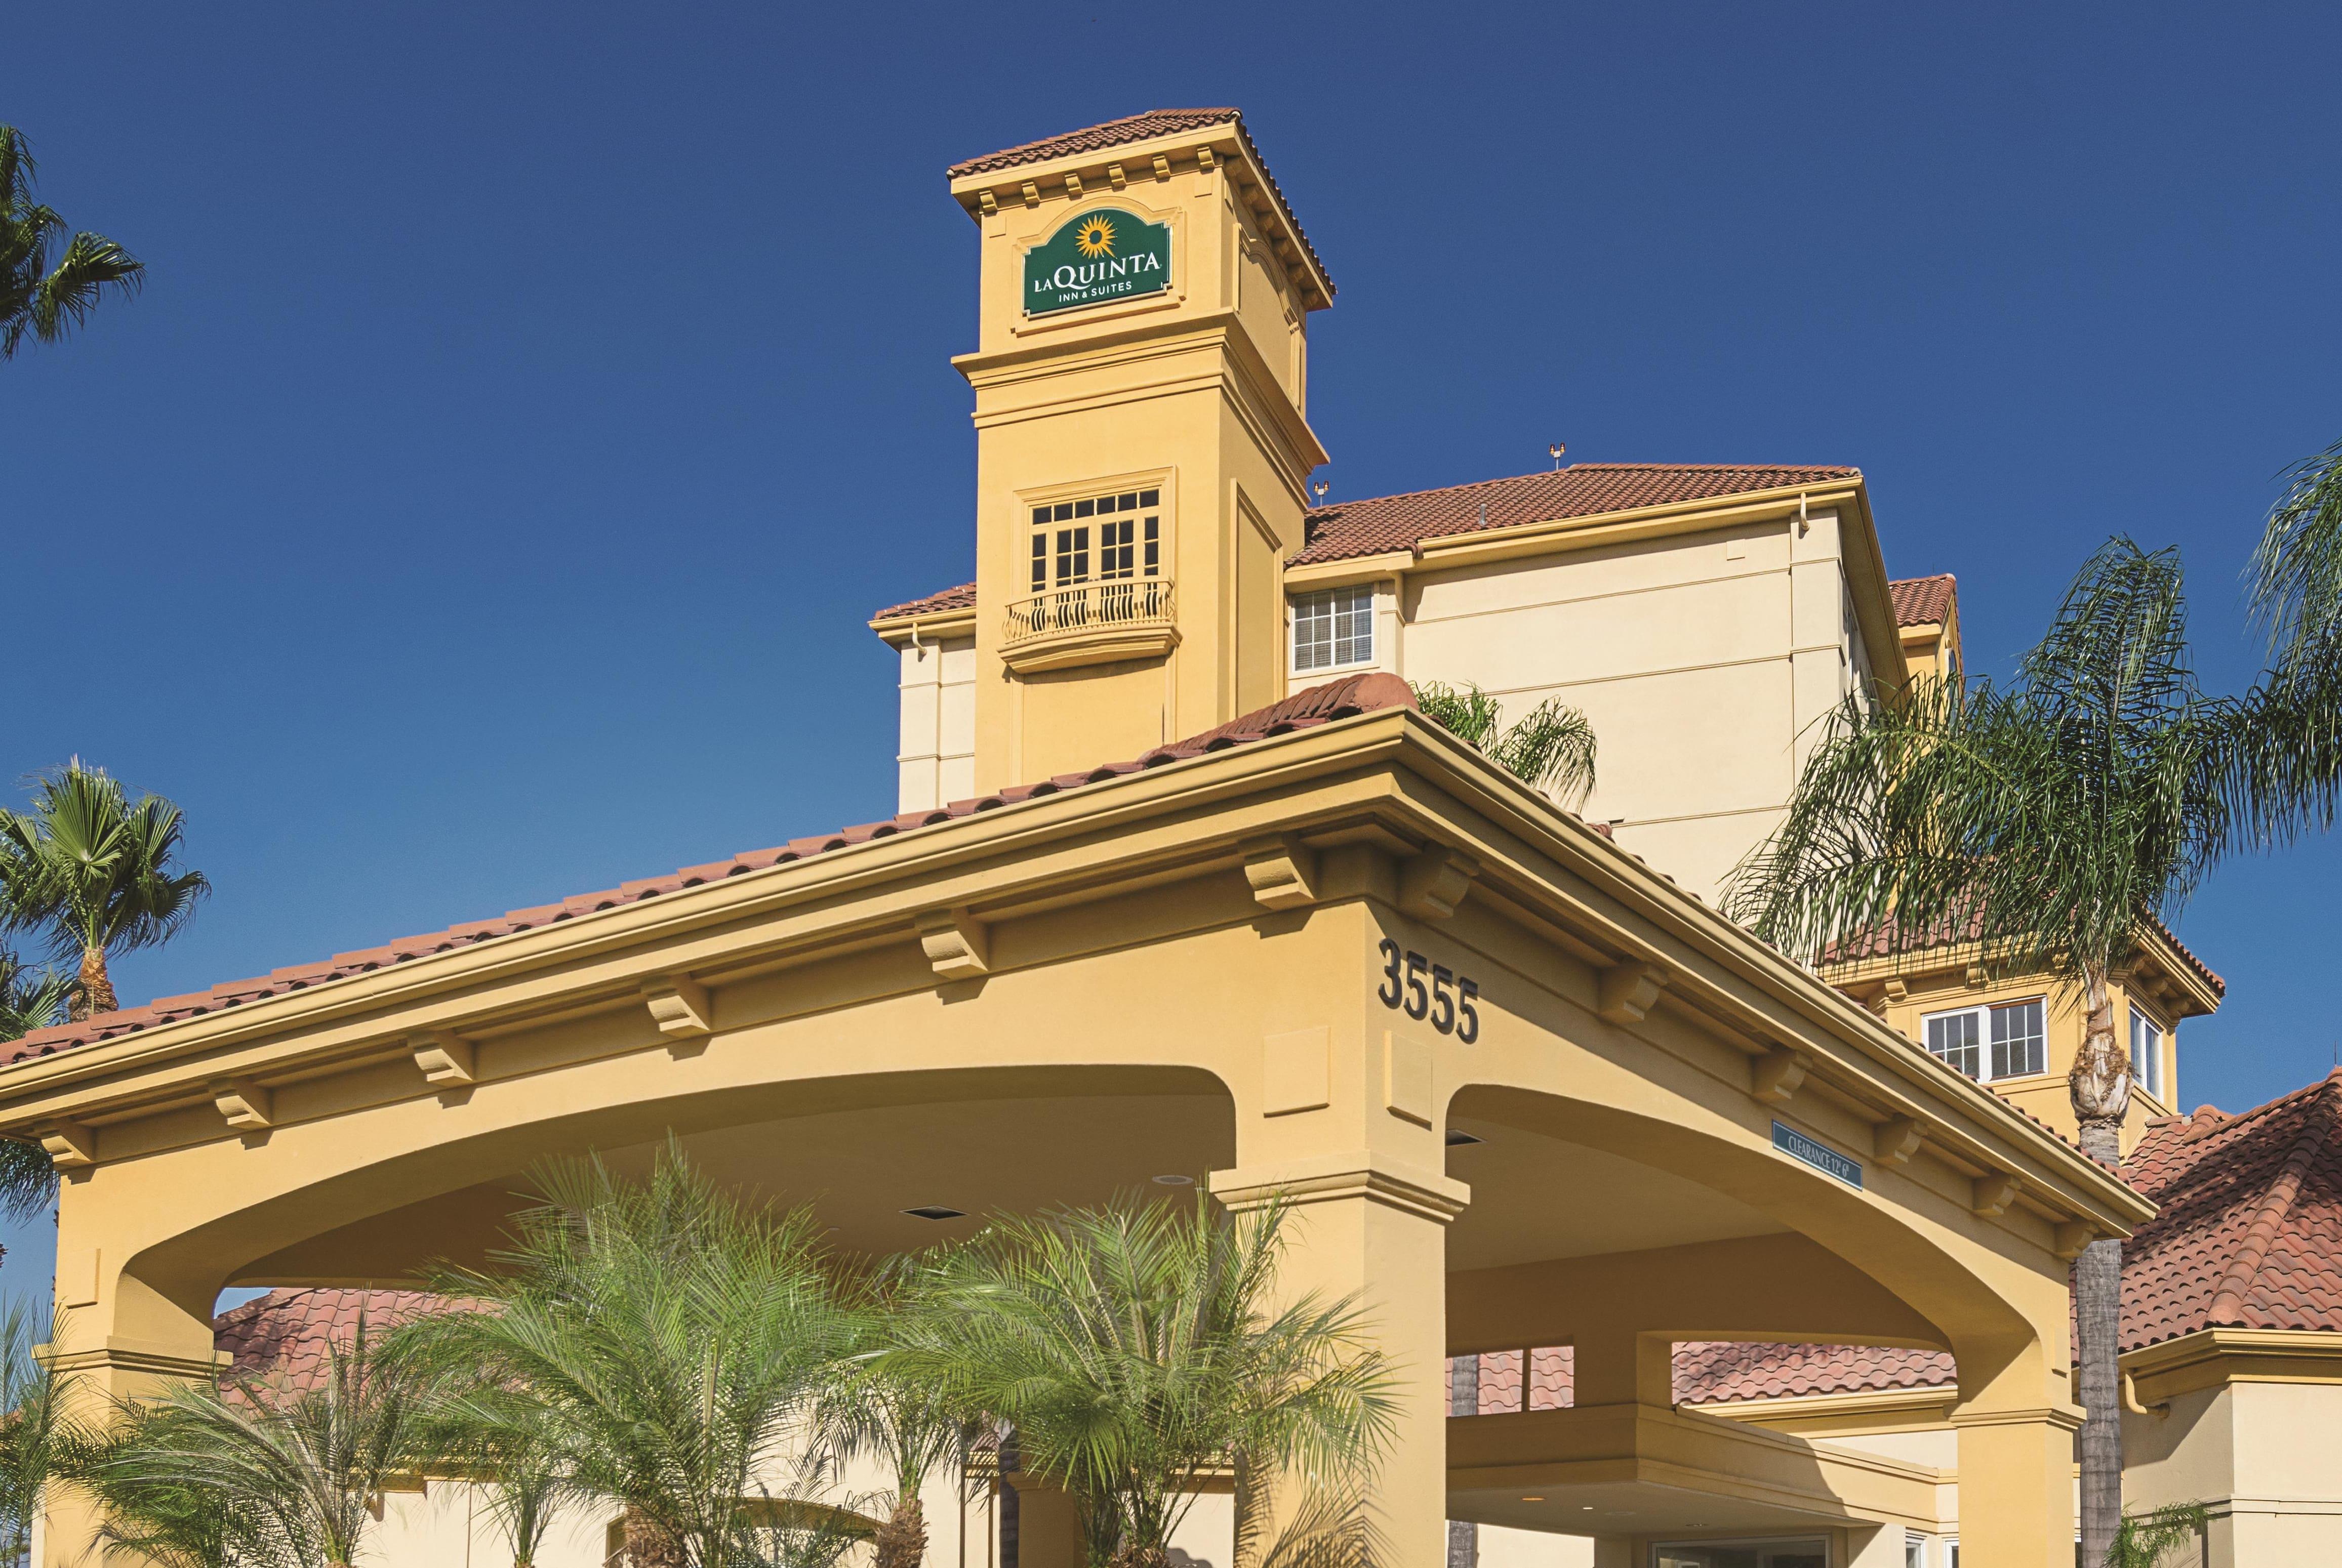 La Quinta Inn Suites By Wyndham Ontario Airport Ontario Ca Hotels